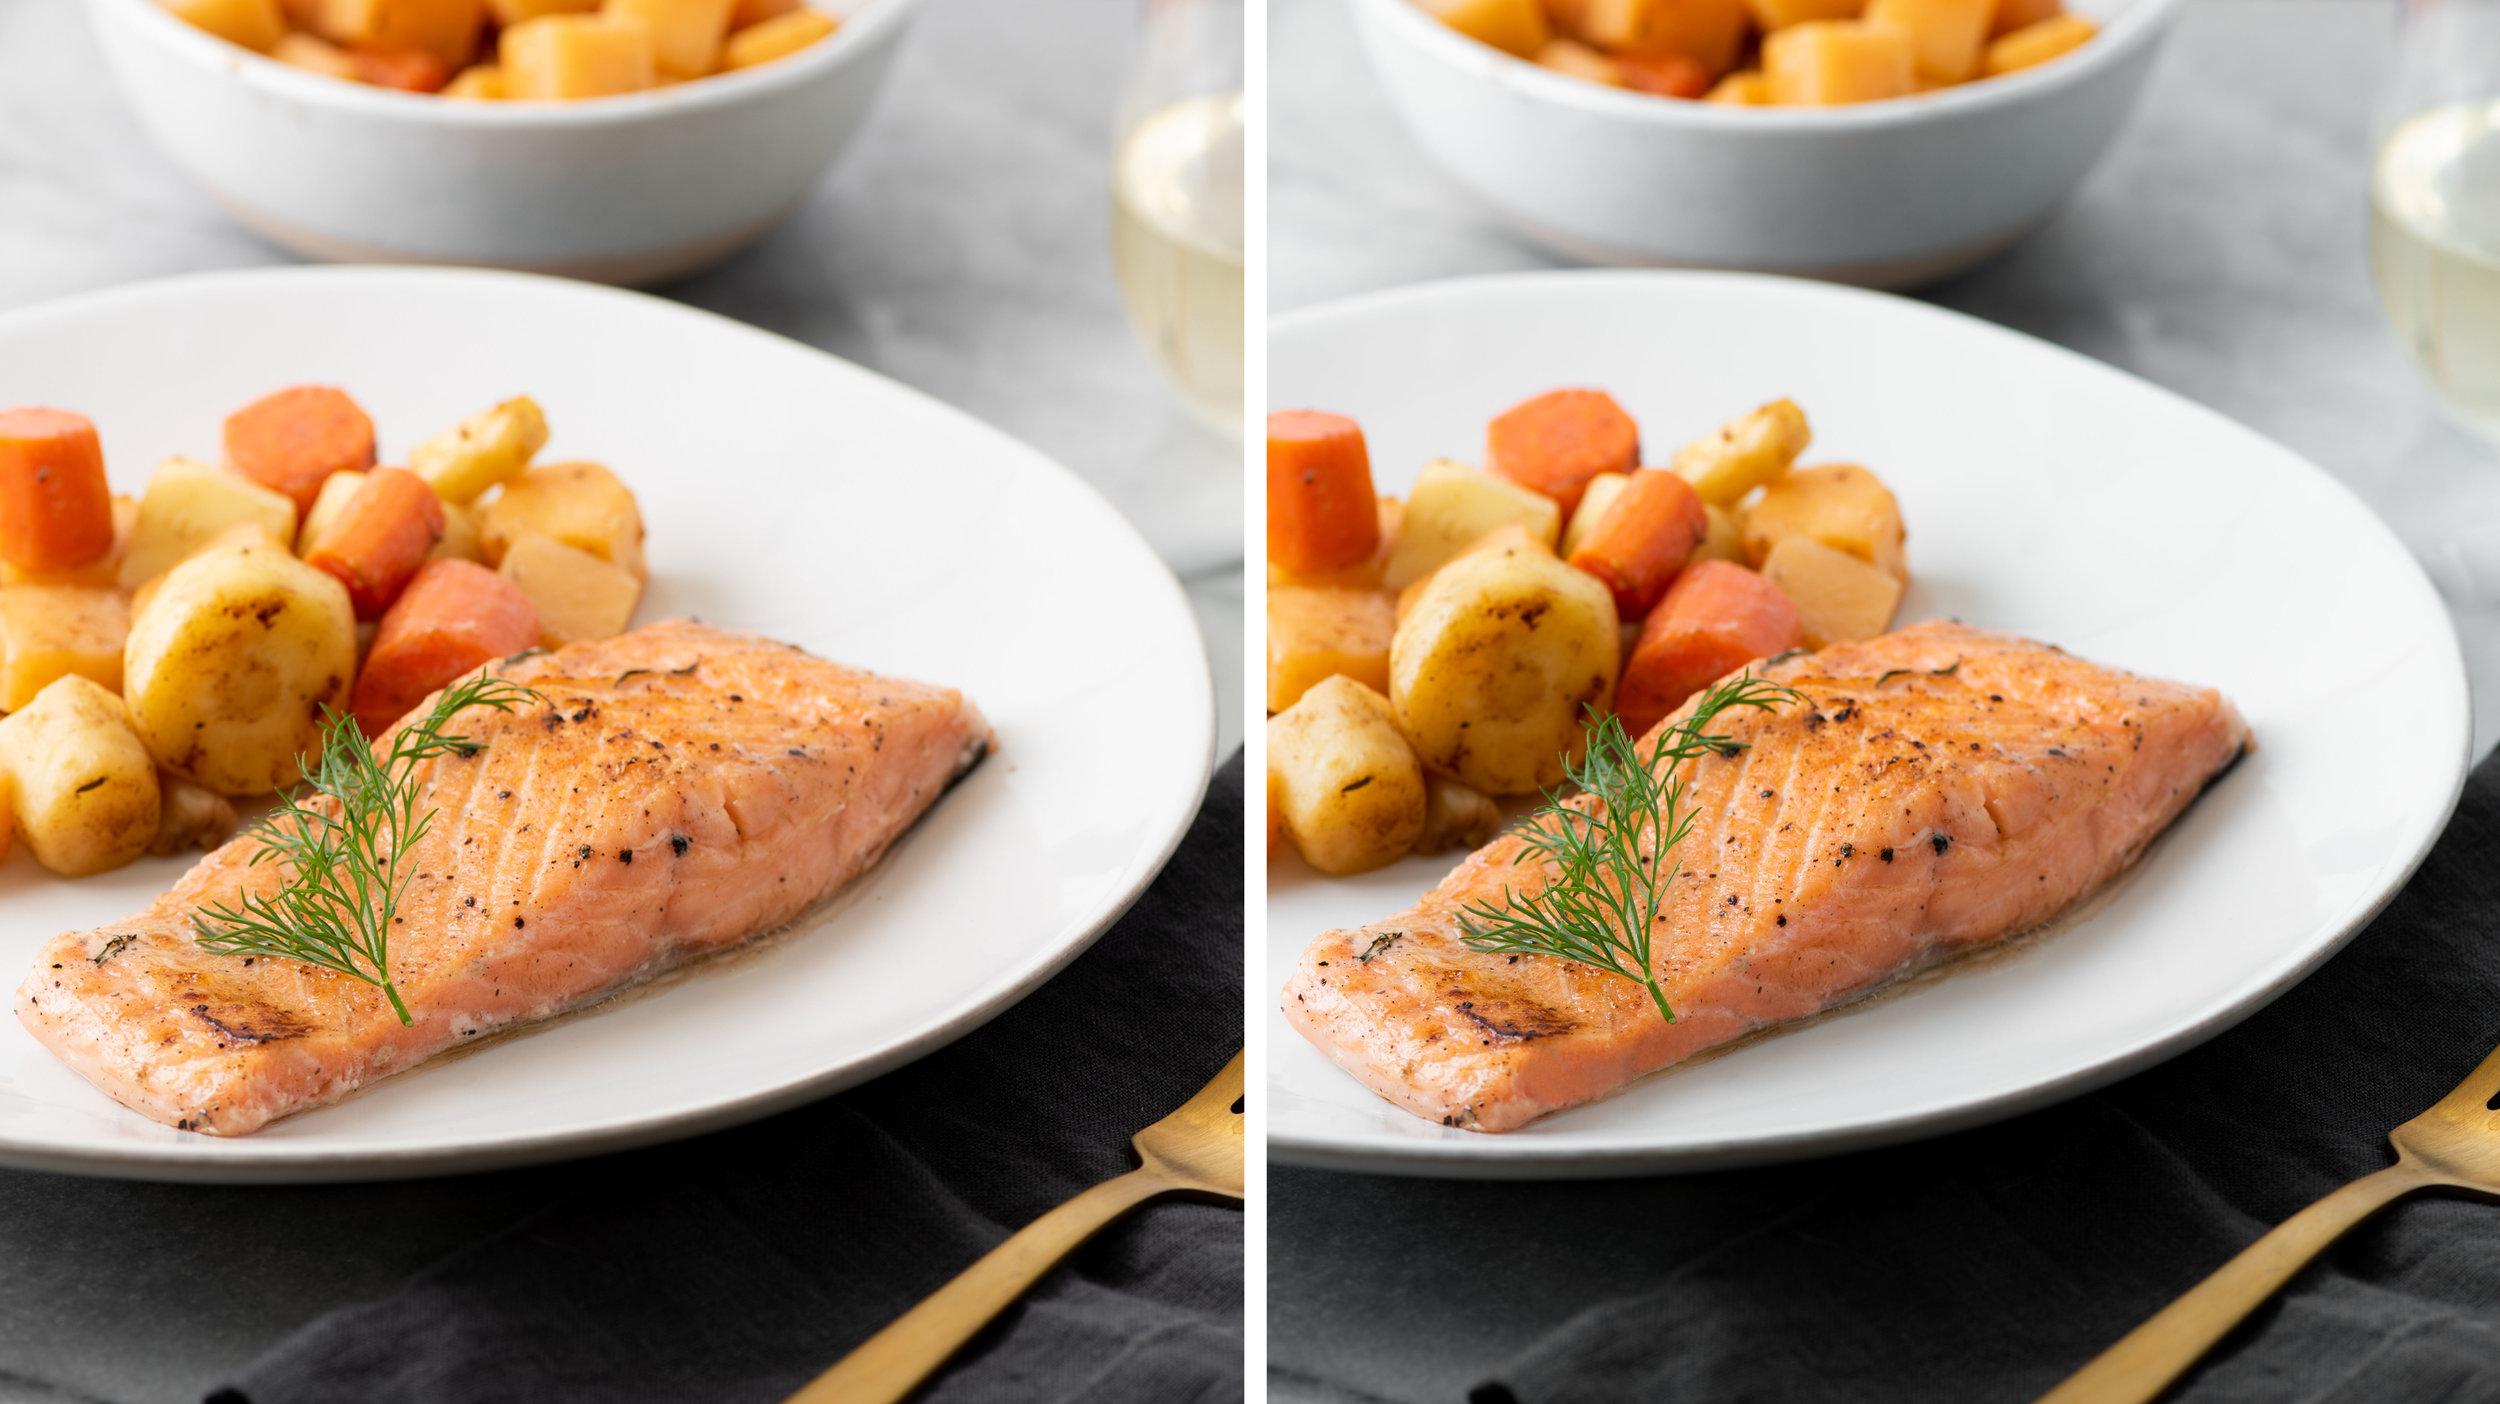 Seafood-DillSalmon.jpg